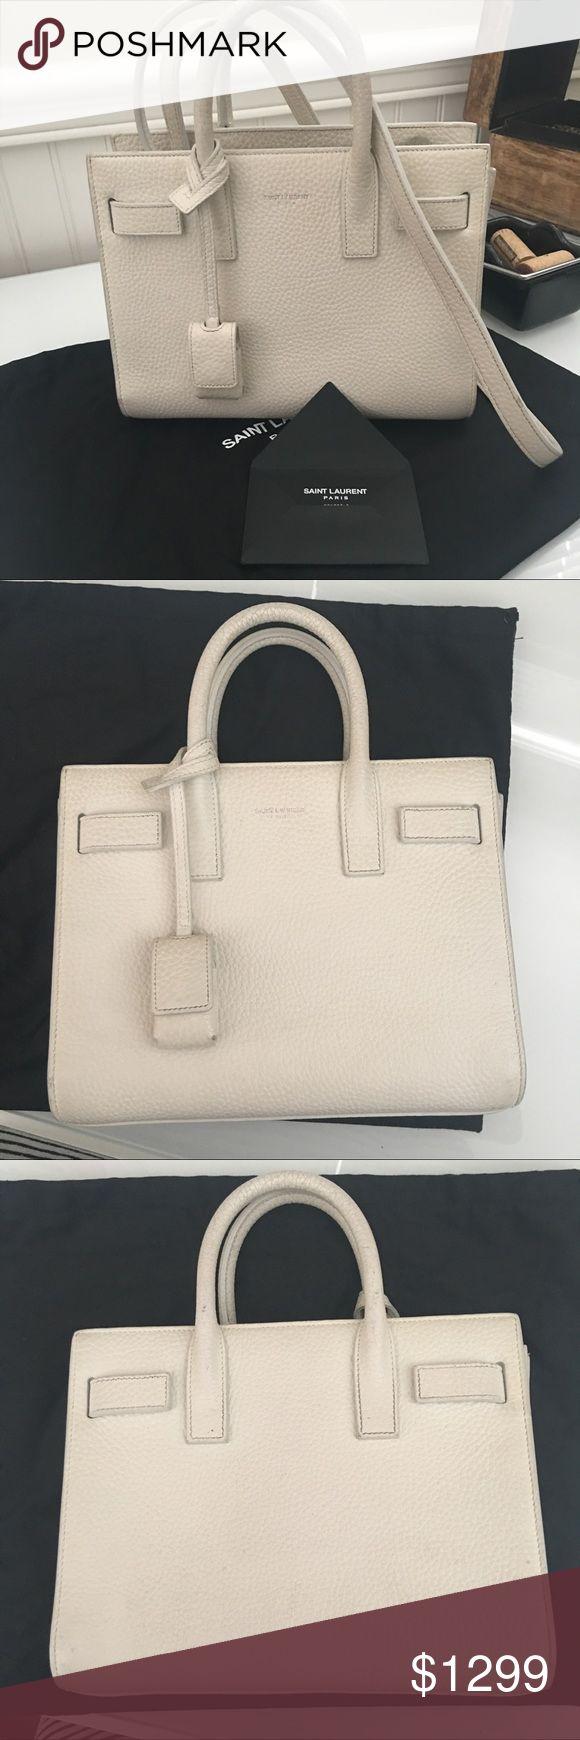 "SAINT LAURENT Nano Sac De Jour Bag SAINT LAURENT Nano Sac De Jour Bag in White. Grained calfskin leather with grosgrain lining and silver tone hardware. Made in Italy. Detachable shoulder strap. Measures 8.5""W x 7""H x 4.25""D. Excellent condition, comes with dust bag and bag number. Saint Laurent Bags Crossbody Bags"